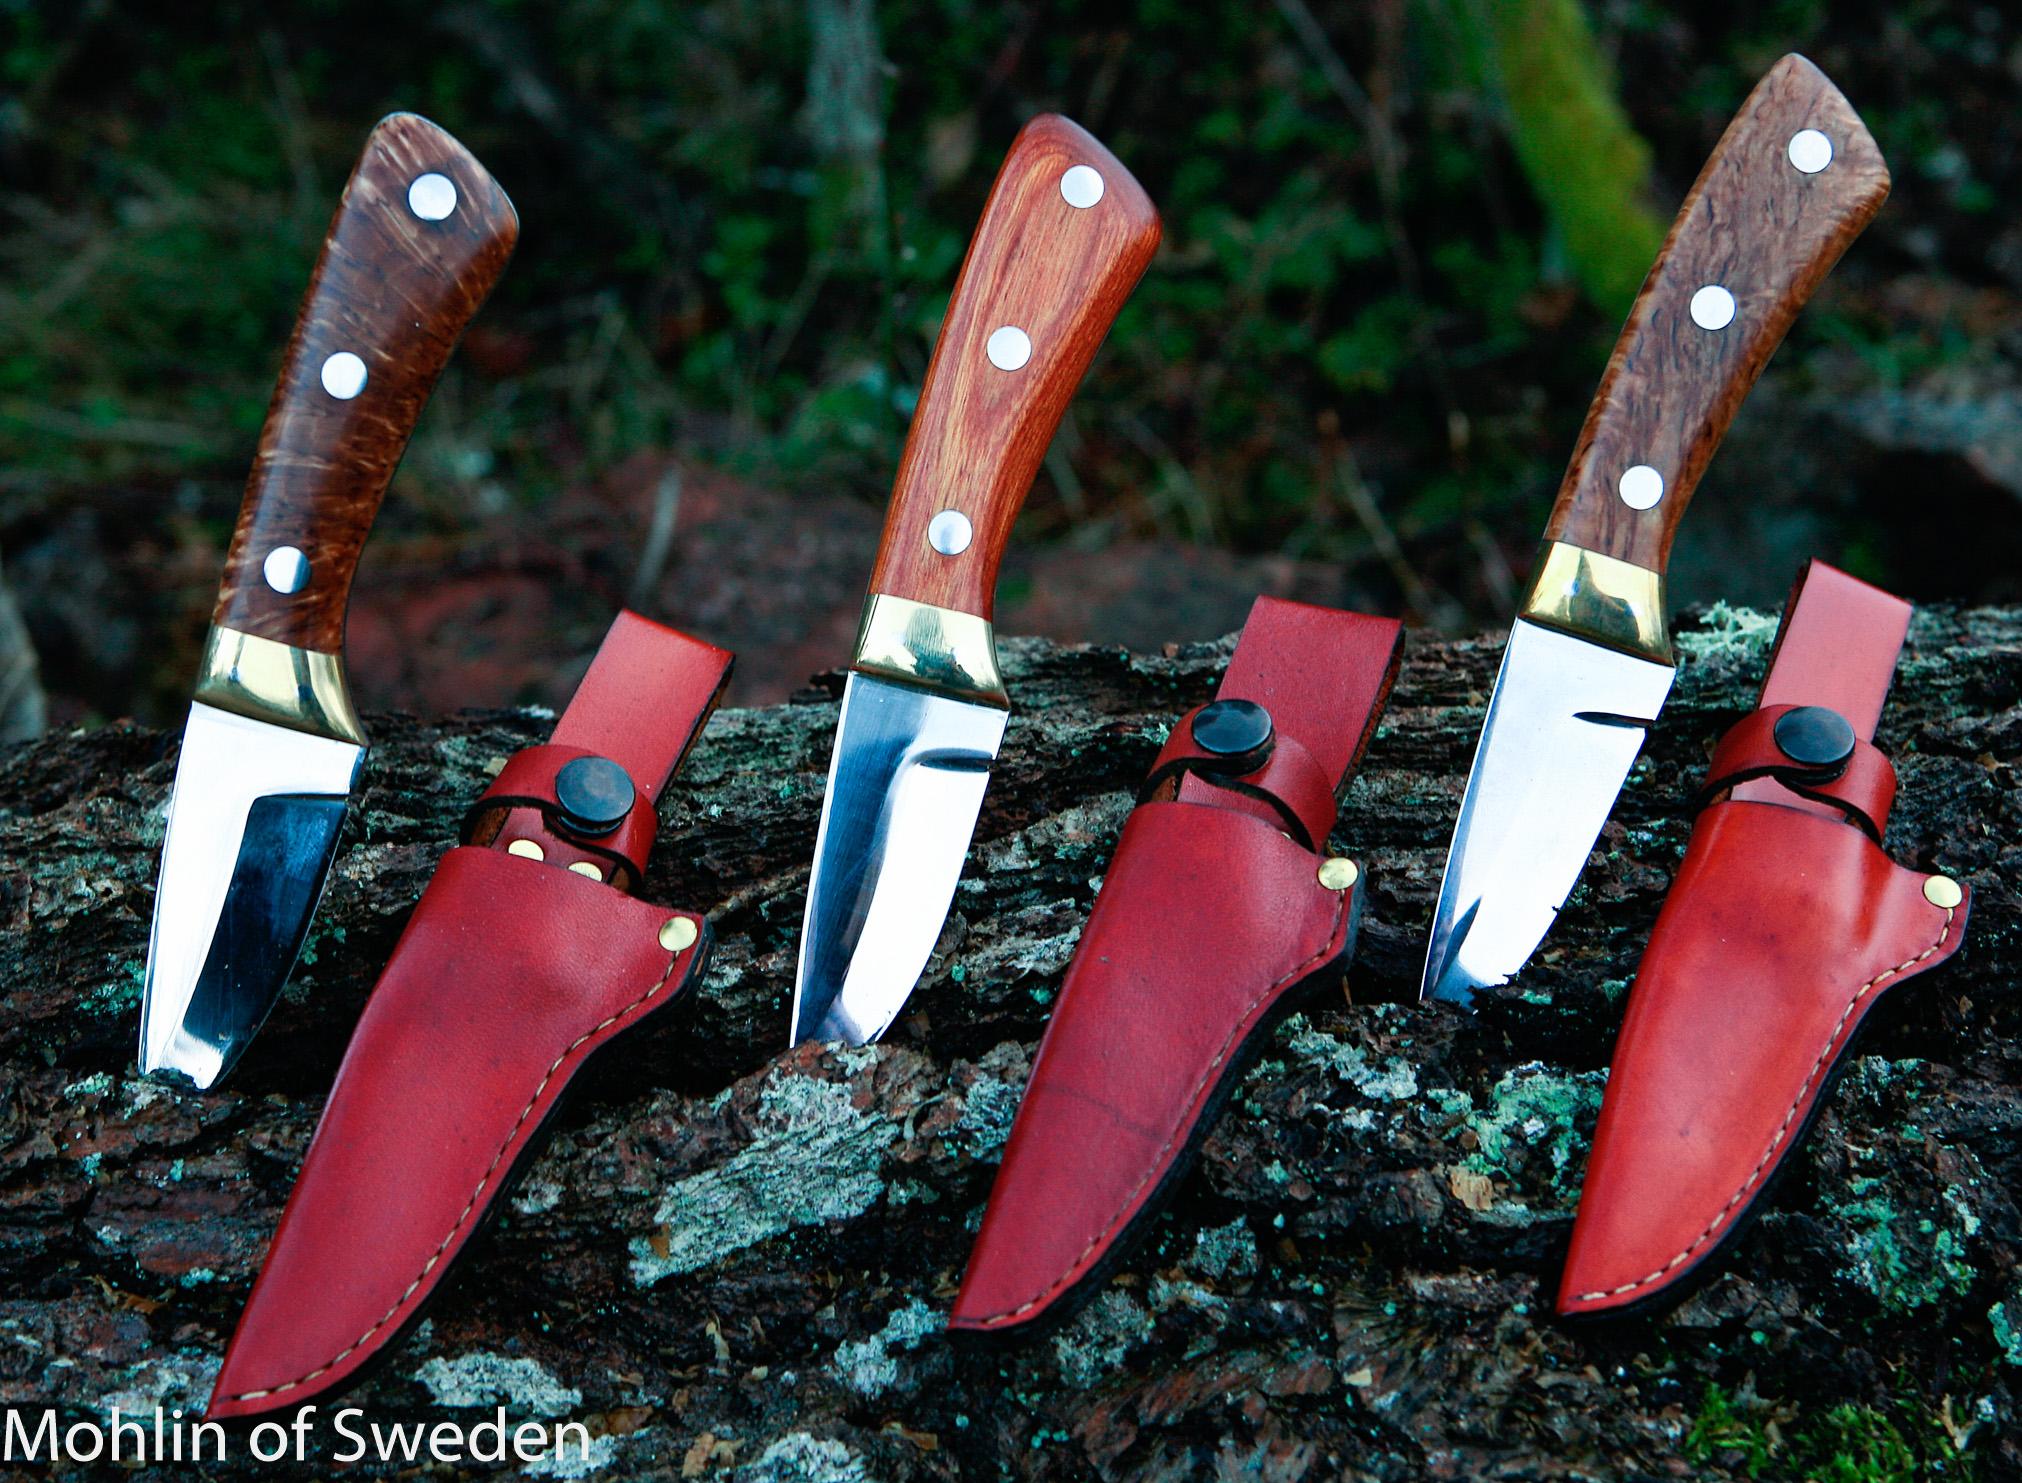 Mohlin of Sweden knives